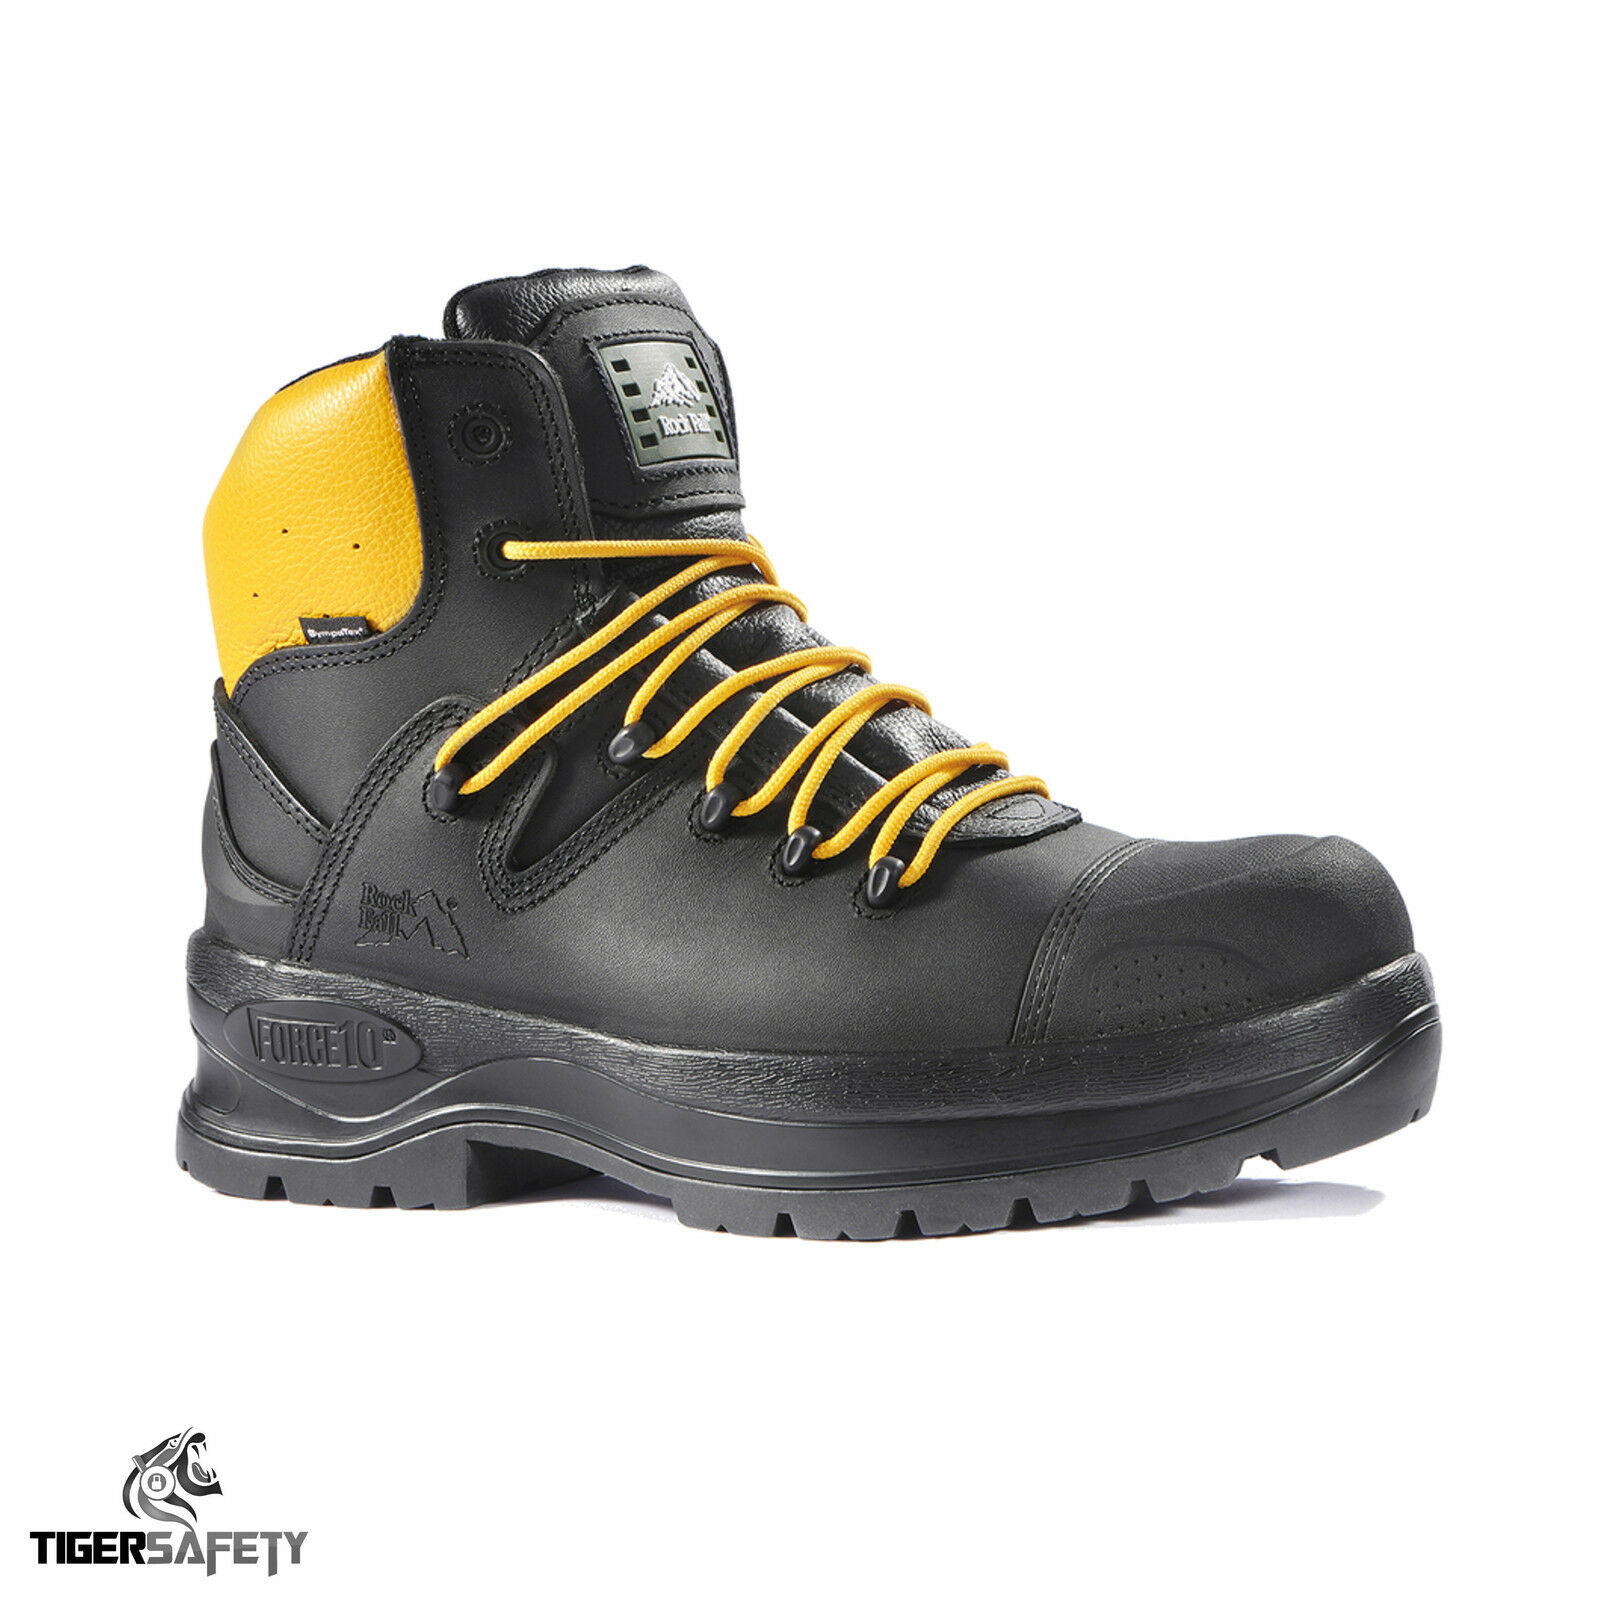 Rock Fall Power RF900 Nero 100% non metallici Electrical PPE Hazard Stivali di Sicurezza PPE Electrical 56199c